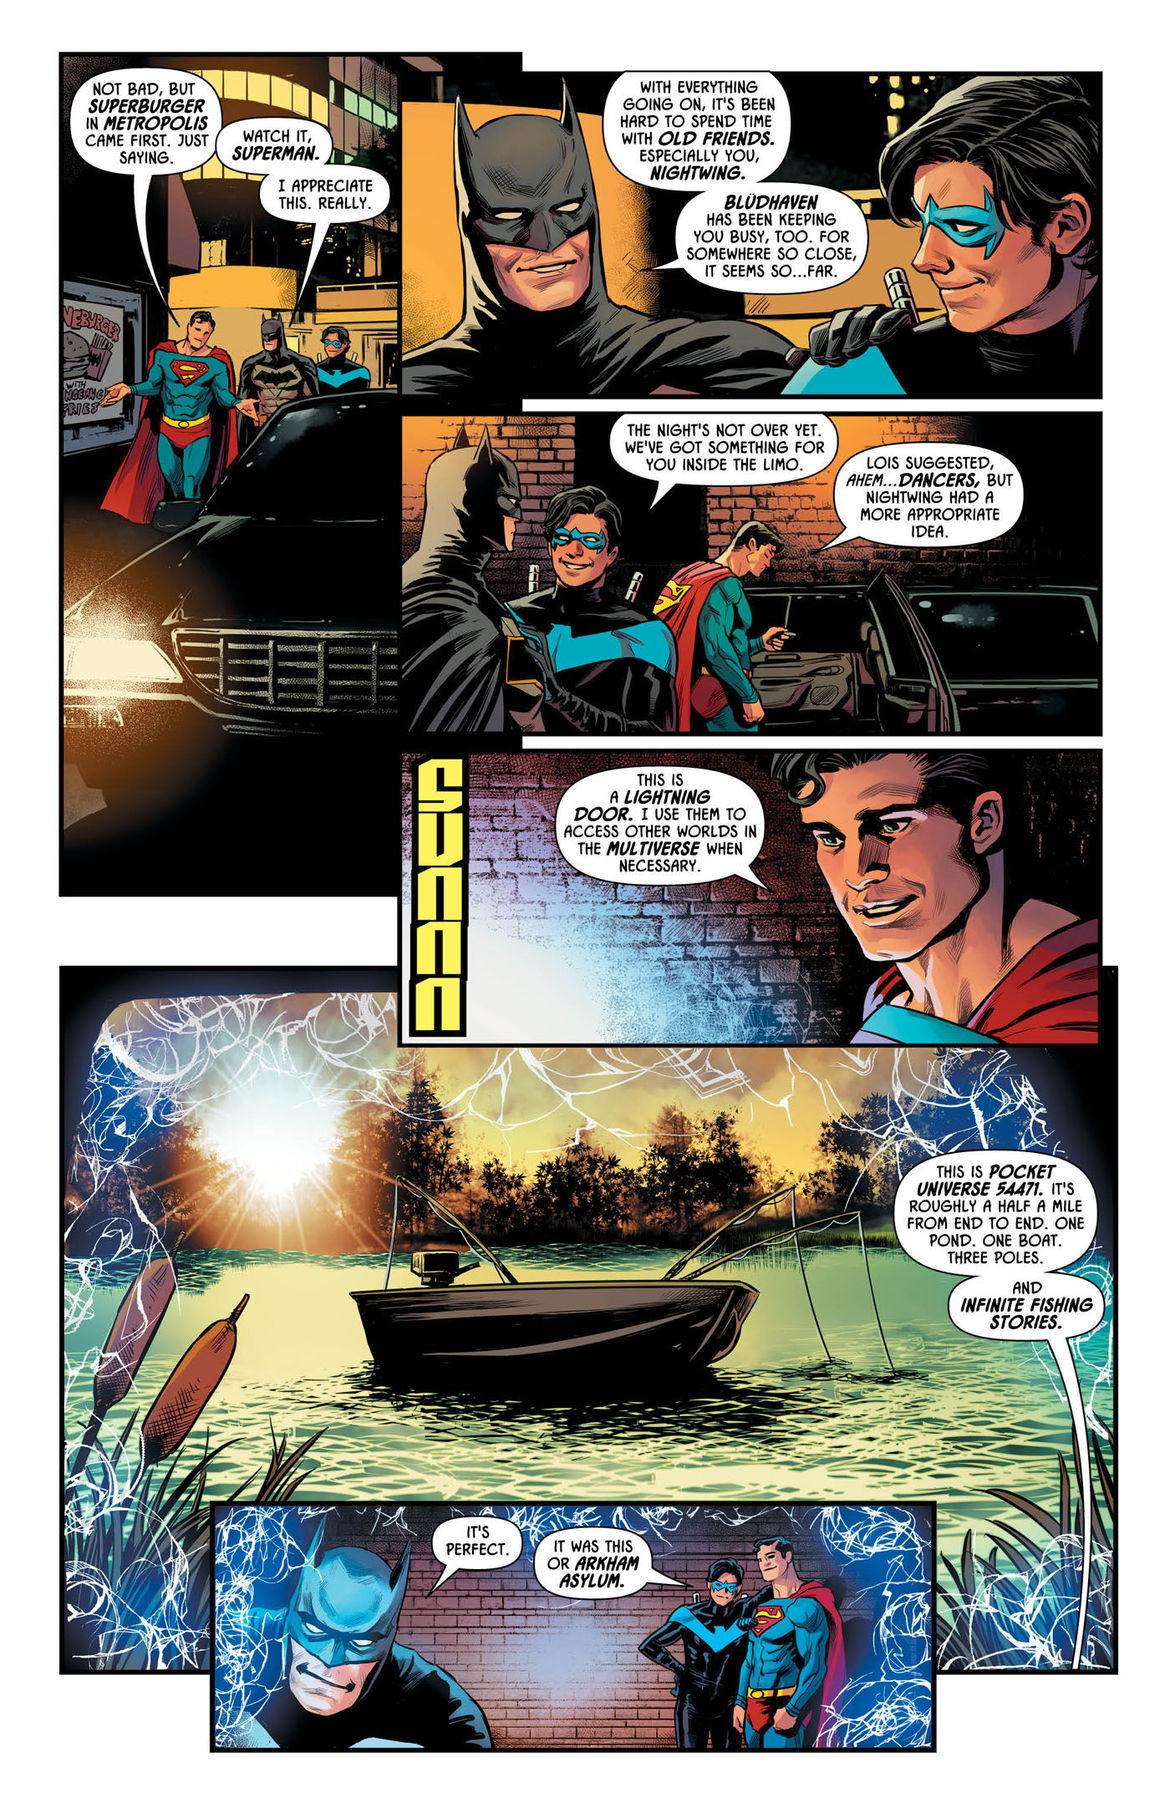 Batman Prelude to the Wedding Nightwing vs Hush 1 page 3